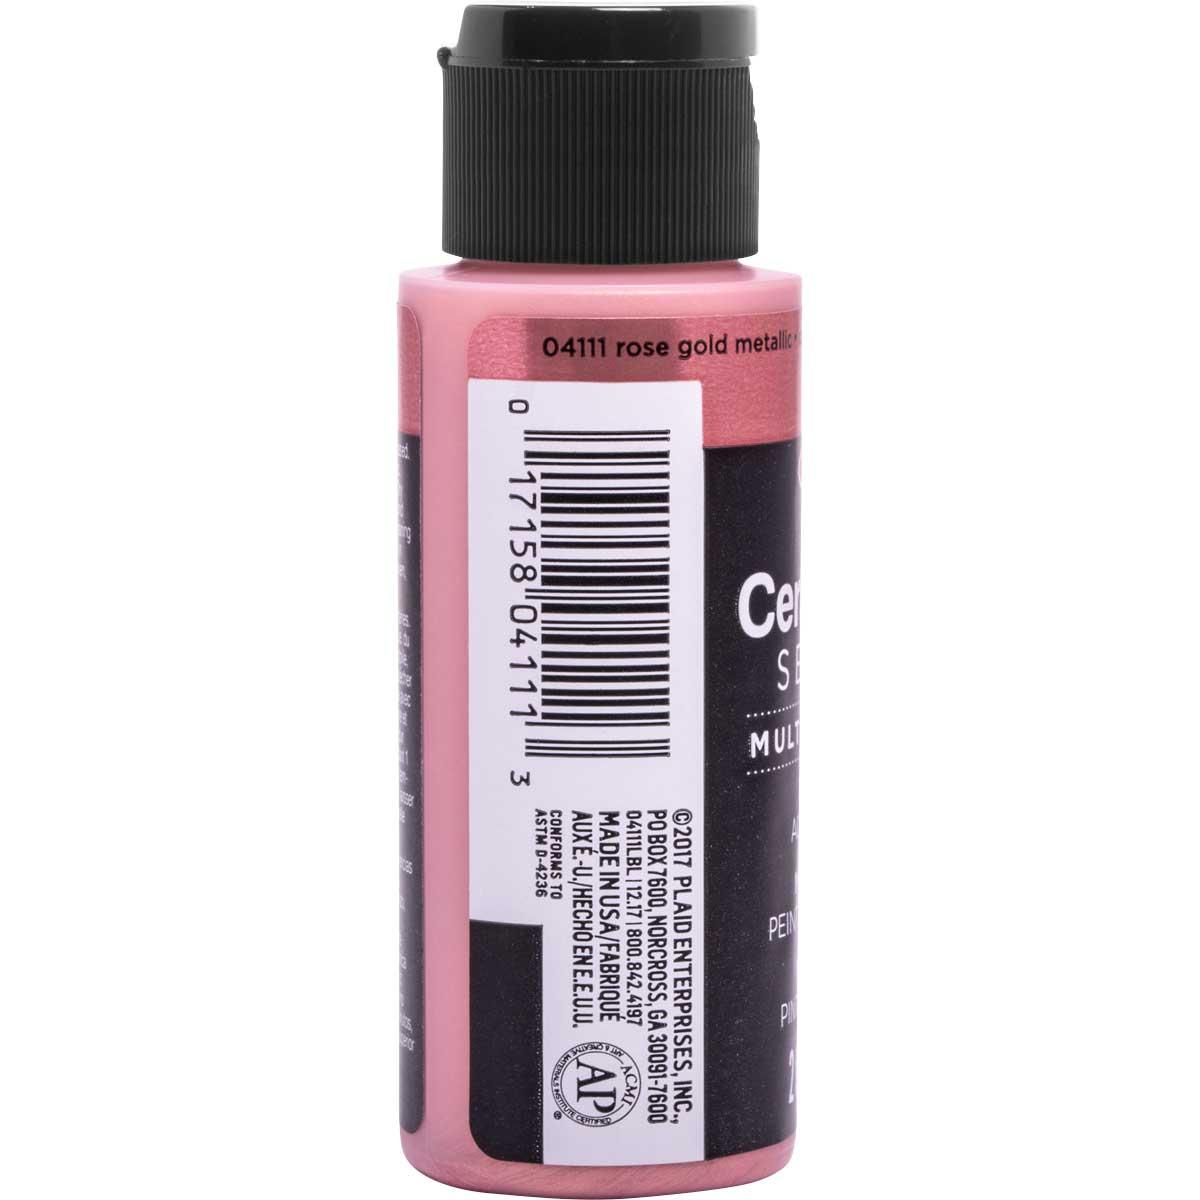 Delta Ceramcoat ® Select Multi-Surface Acrylic Paint - Metallic - Rose Gold, 2 oz.